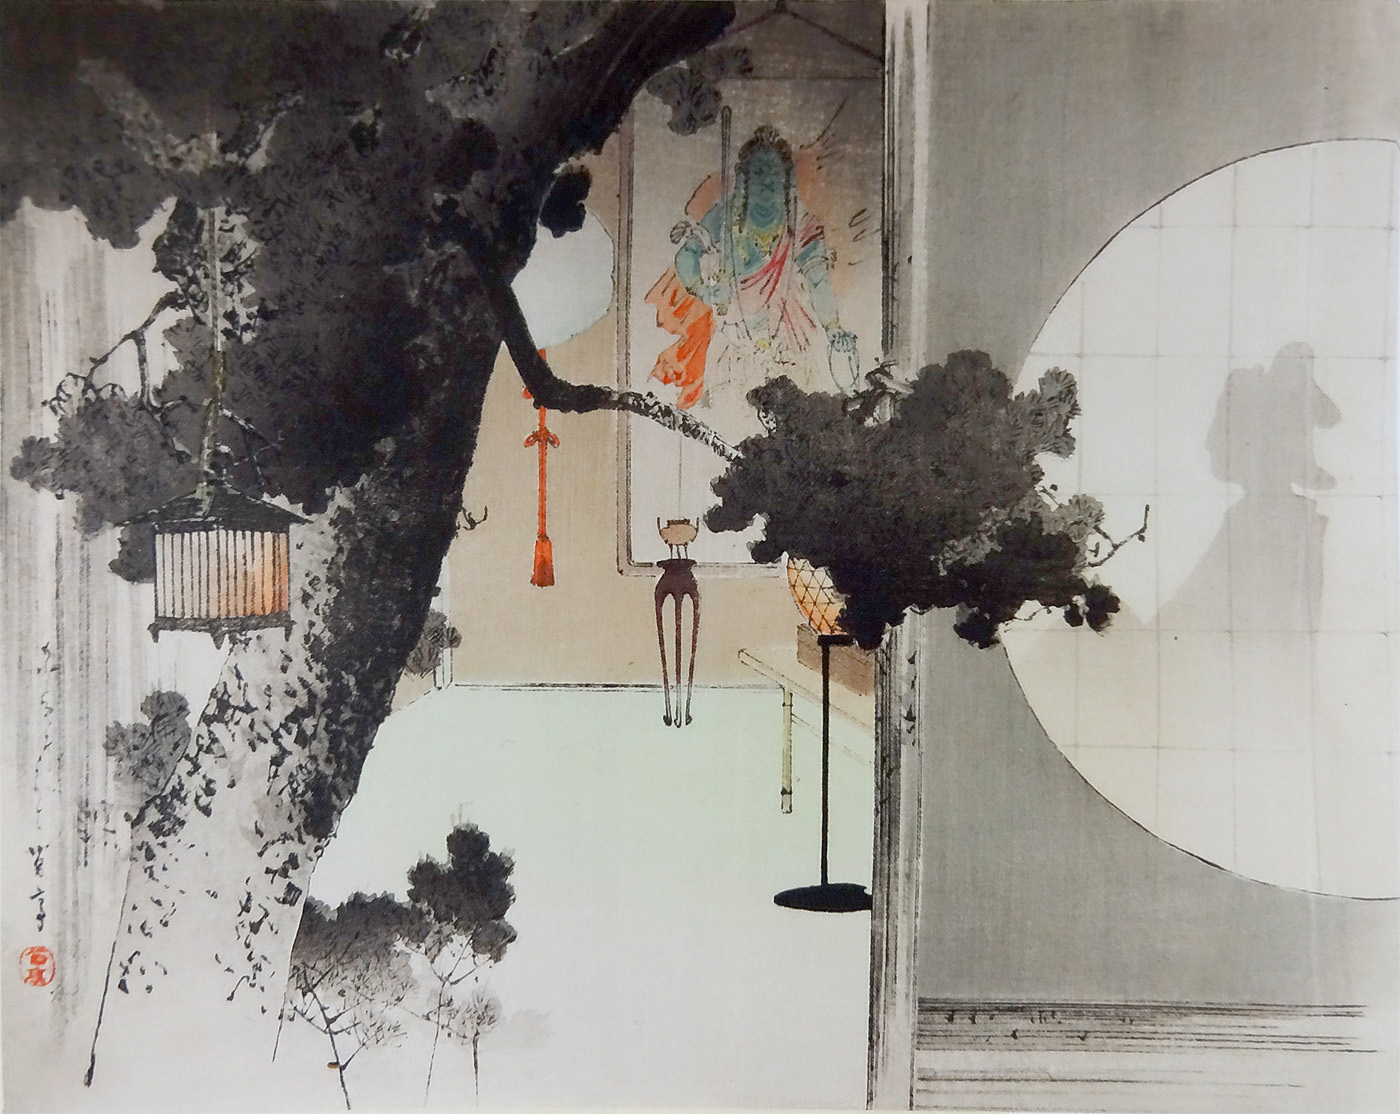 渡辺省亭の画像 p1_34